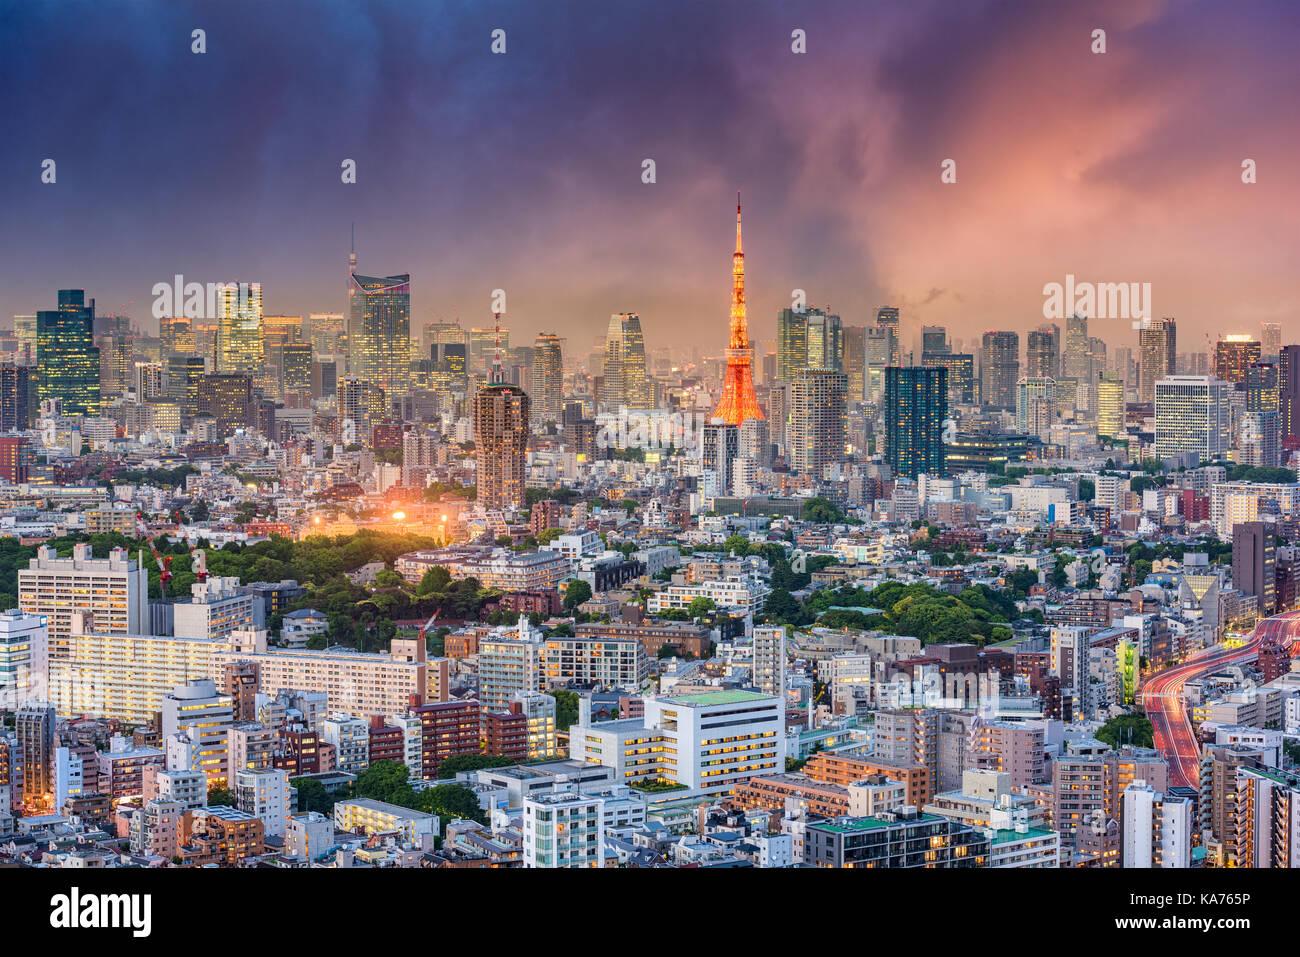 Tokyo, Japan cityscape at dusk. - Stock Image